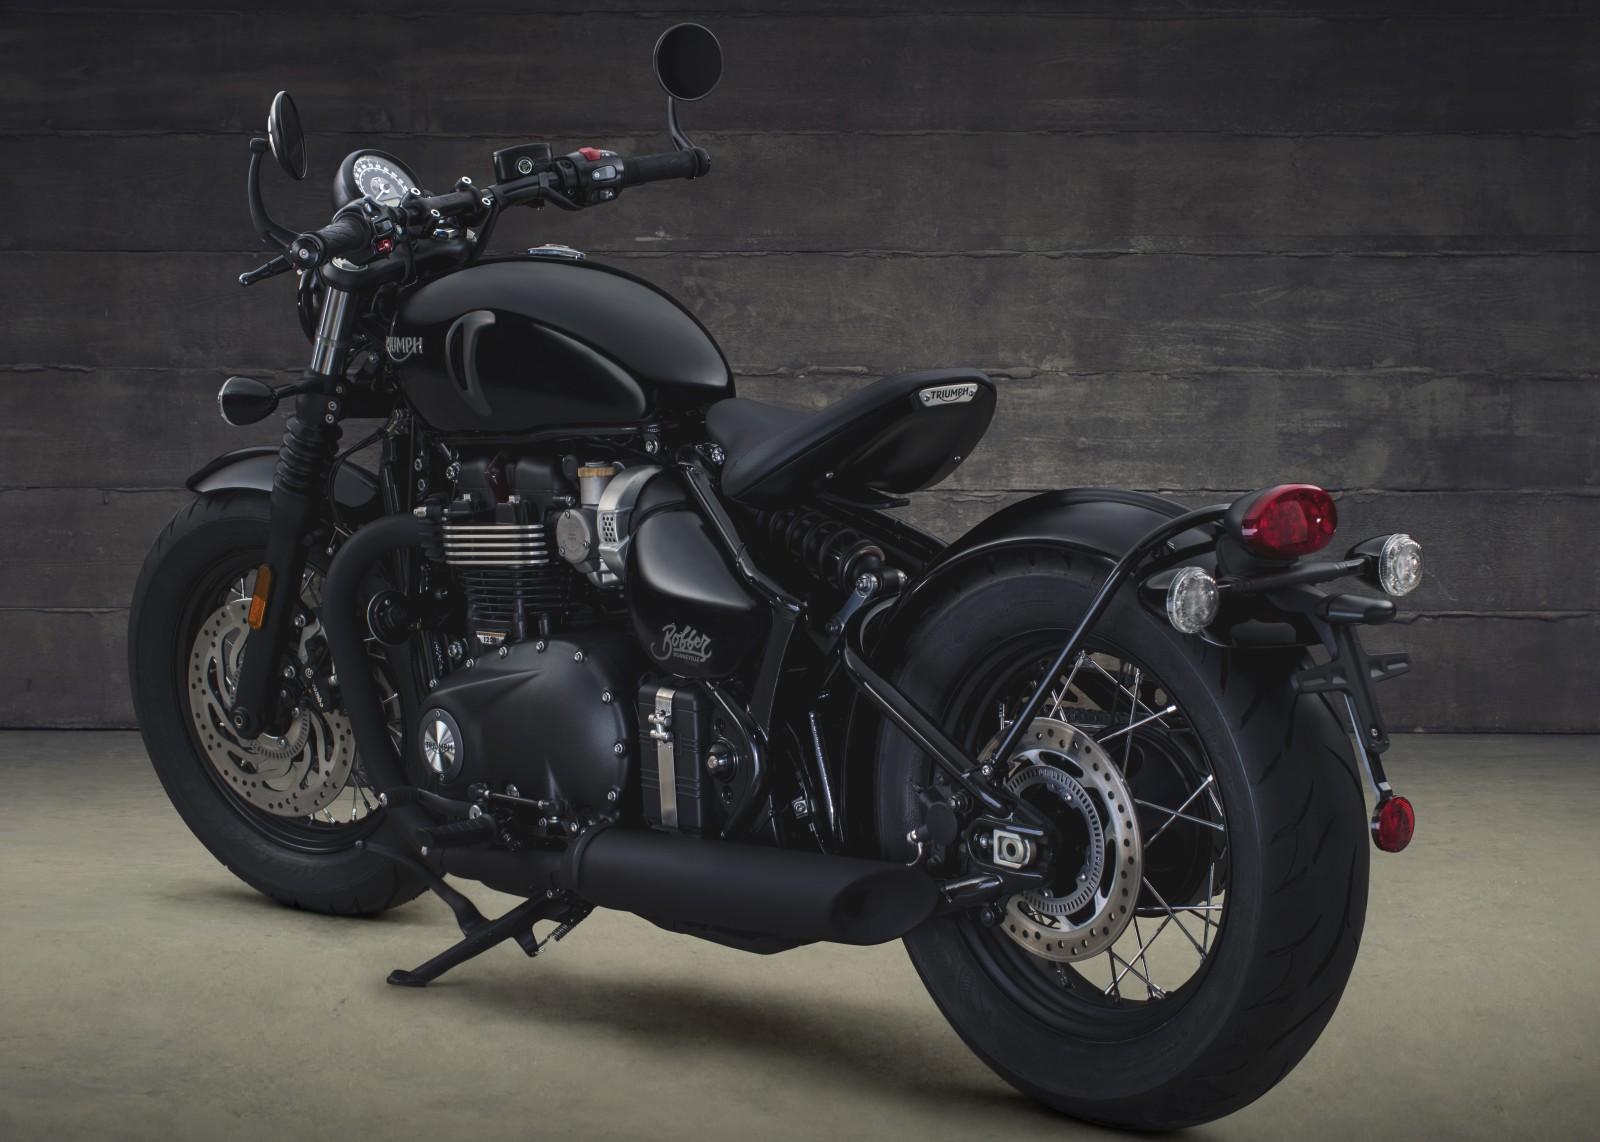 new 2018 triumph bonneville bobber black unveiled motoroids. Black Bedroom Furniture Sets. Home Design Ideas